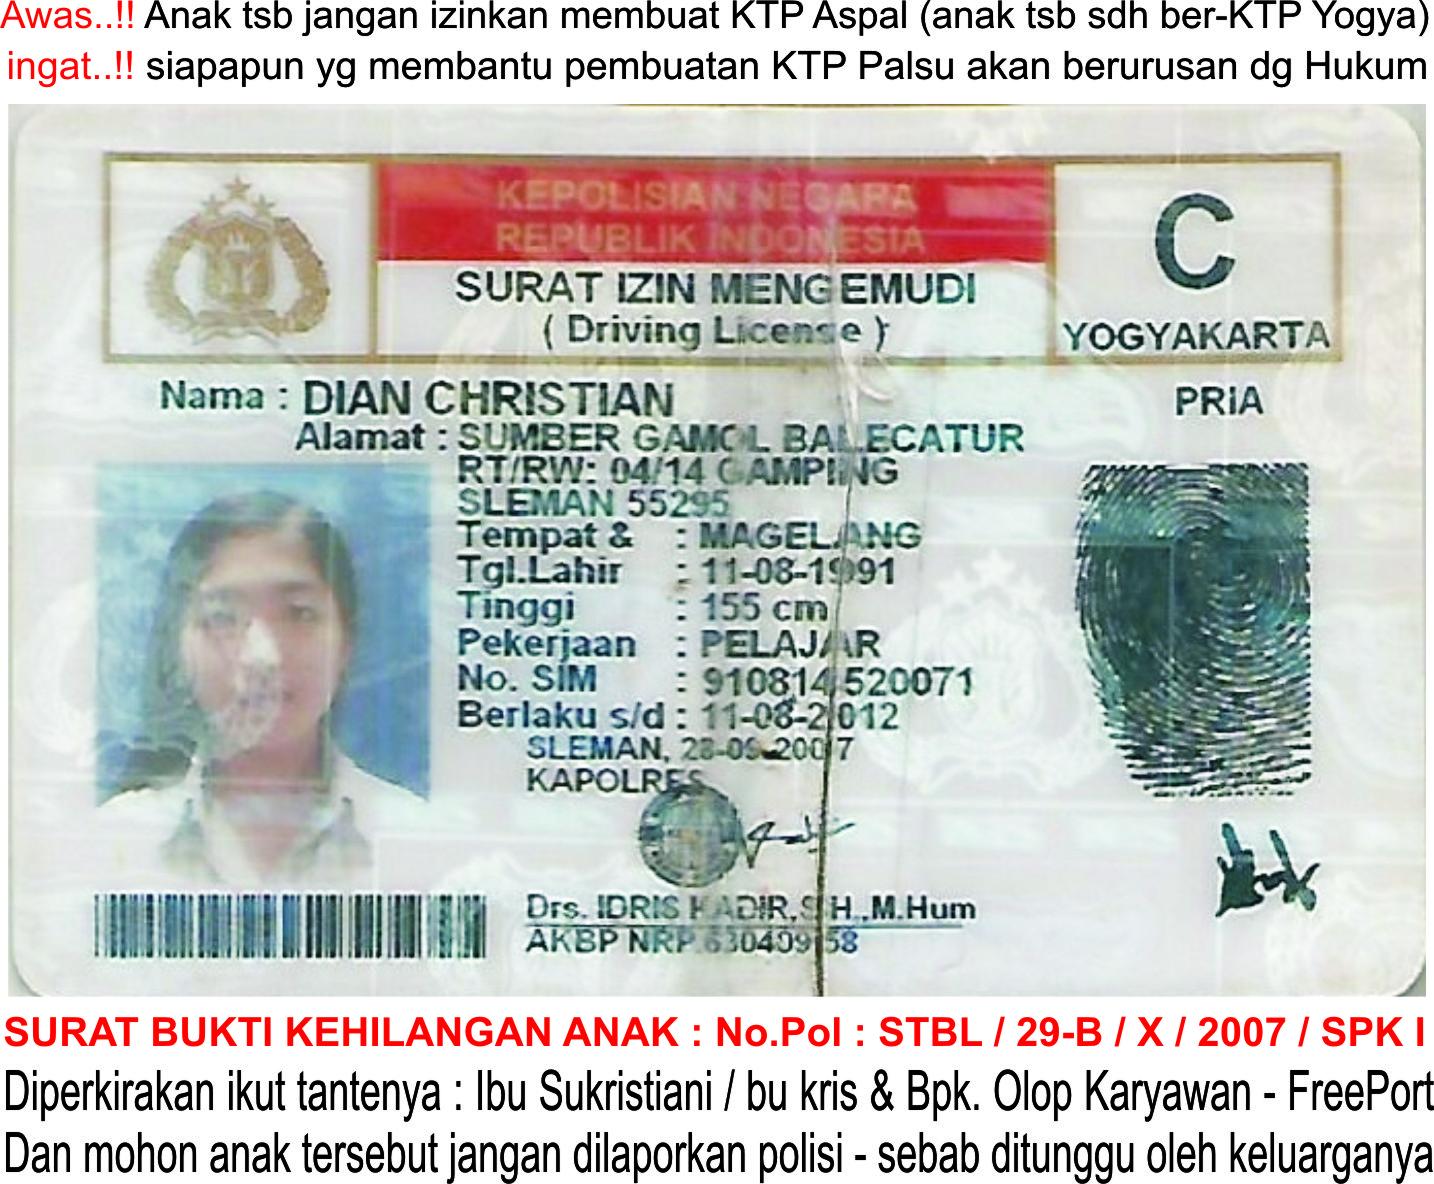 Toko Baja Ringan Bandar Lampung Kota Gereja, Lagu Rohani, Pendeta, Buku, Ret ...